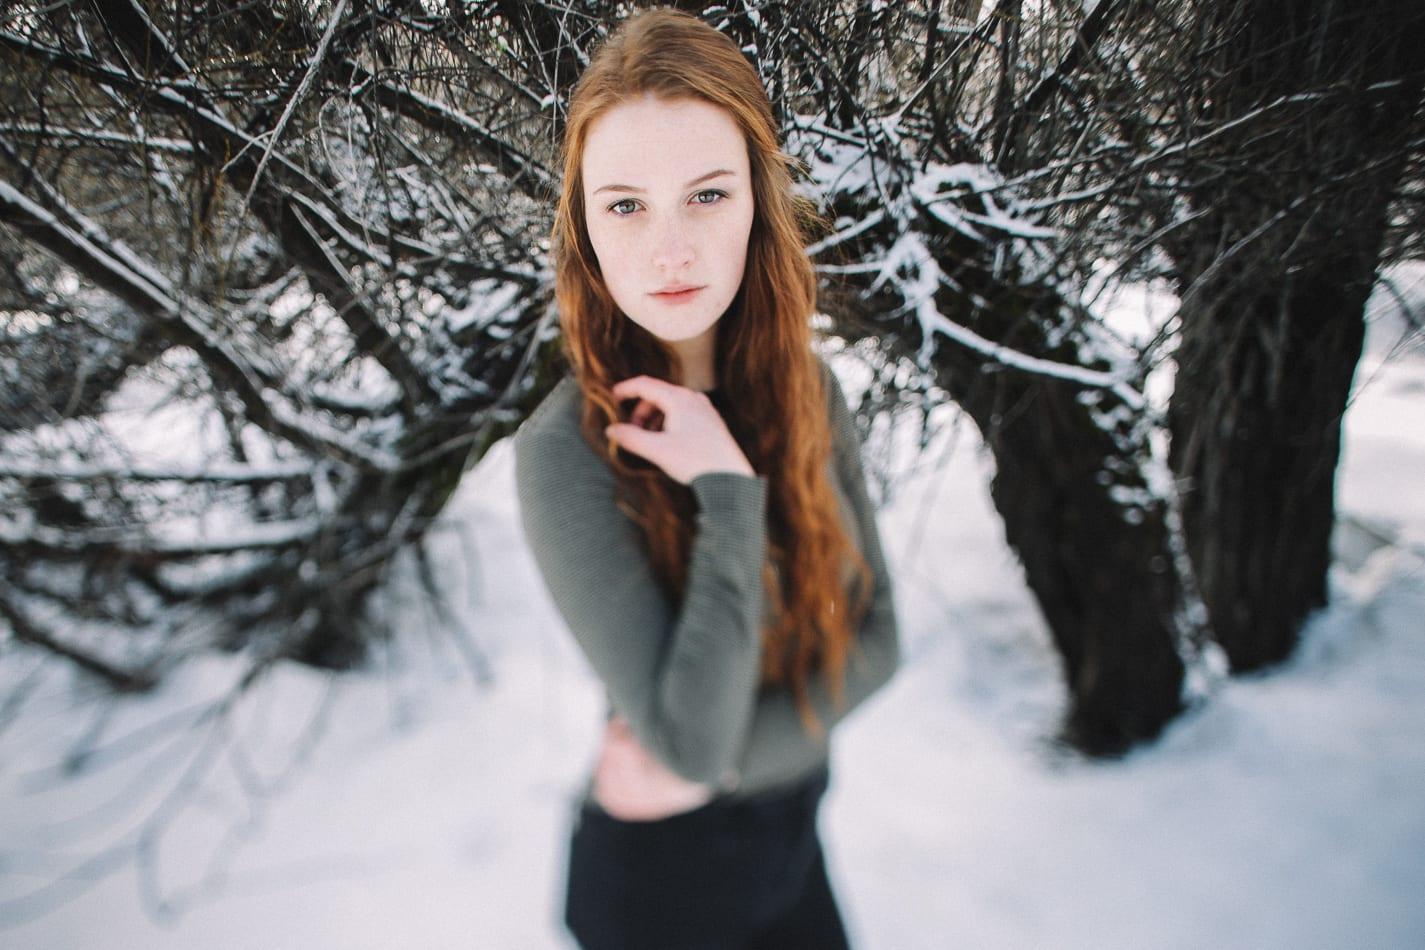 mount-lassen-winter-portrait-photo-6